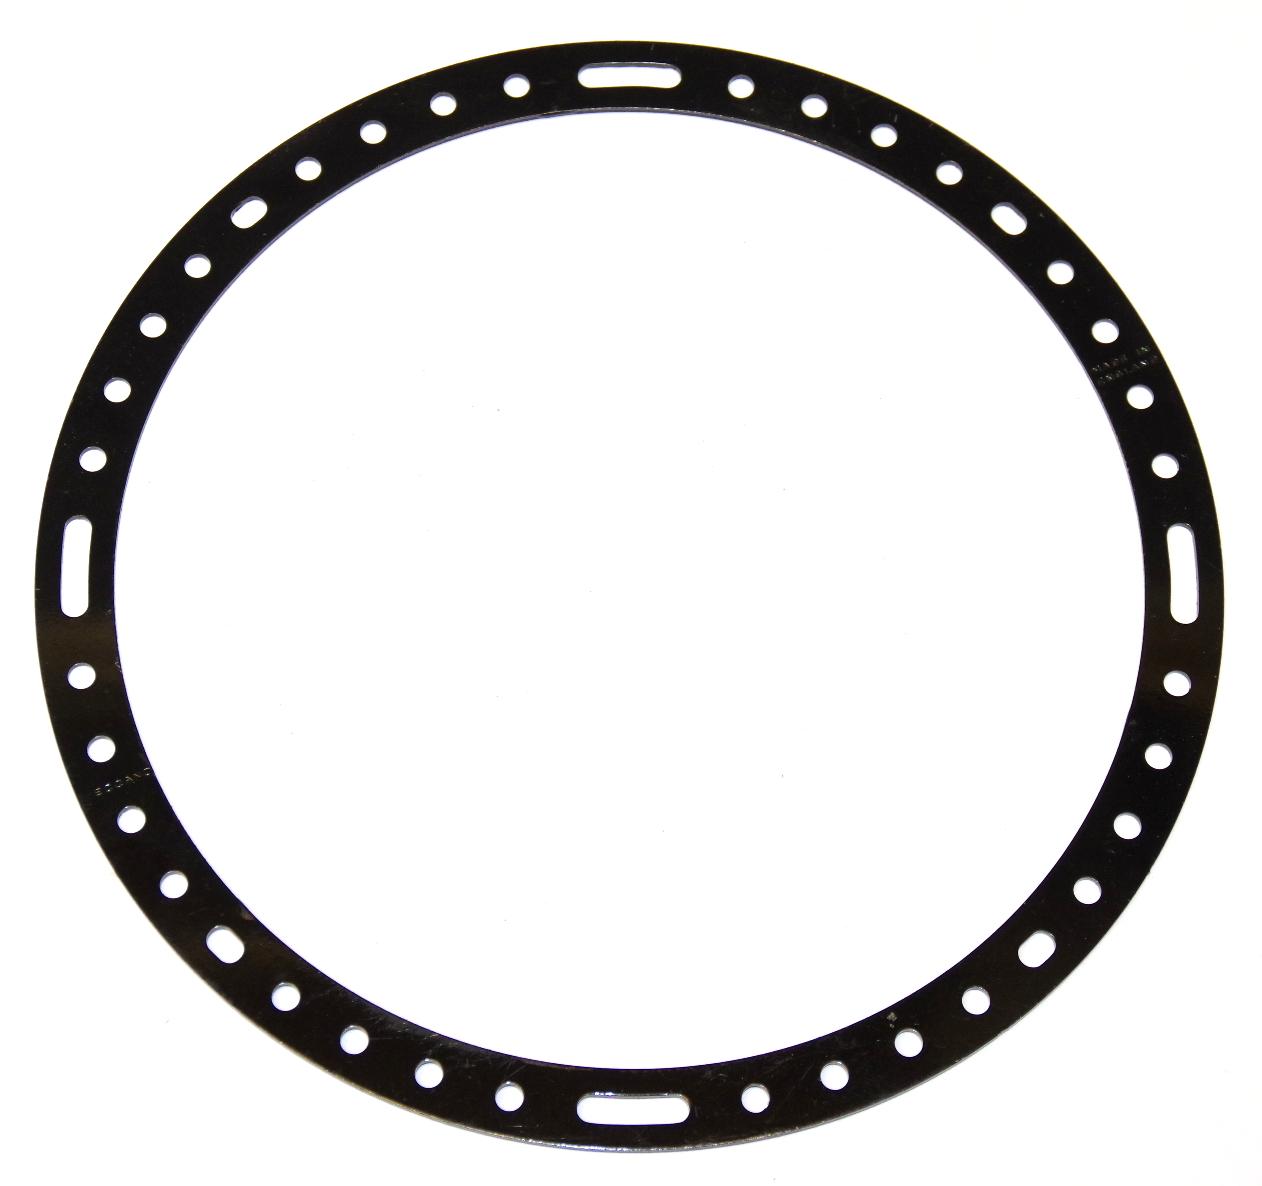 145 Circular Strip 7 Black Original